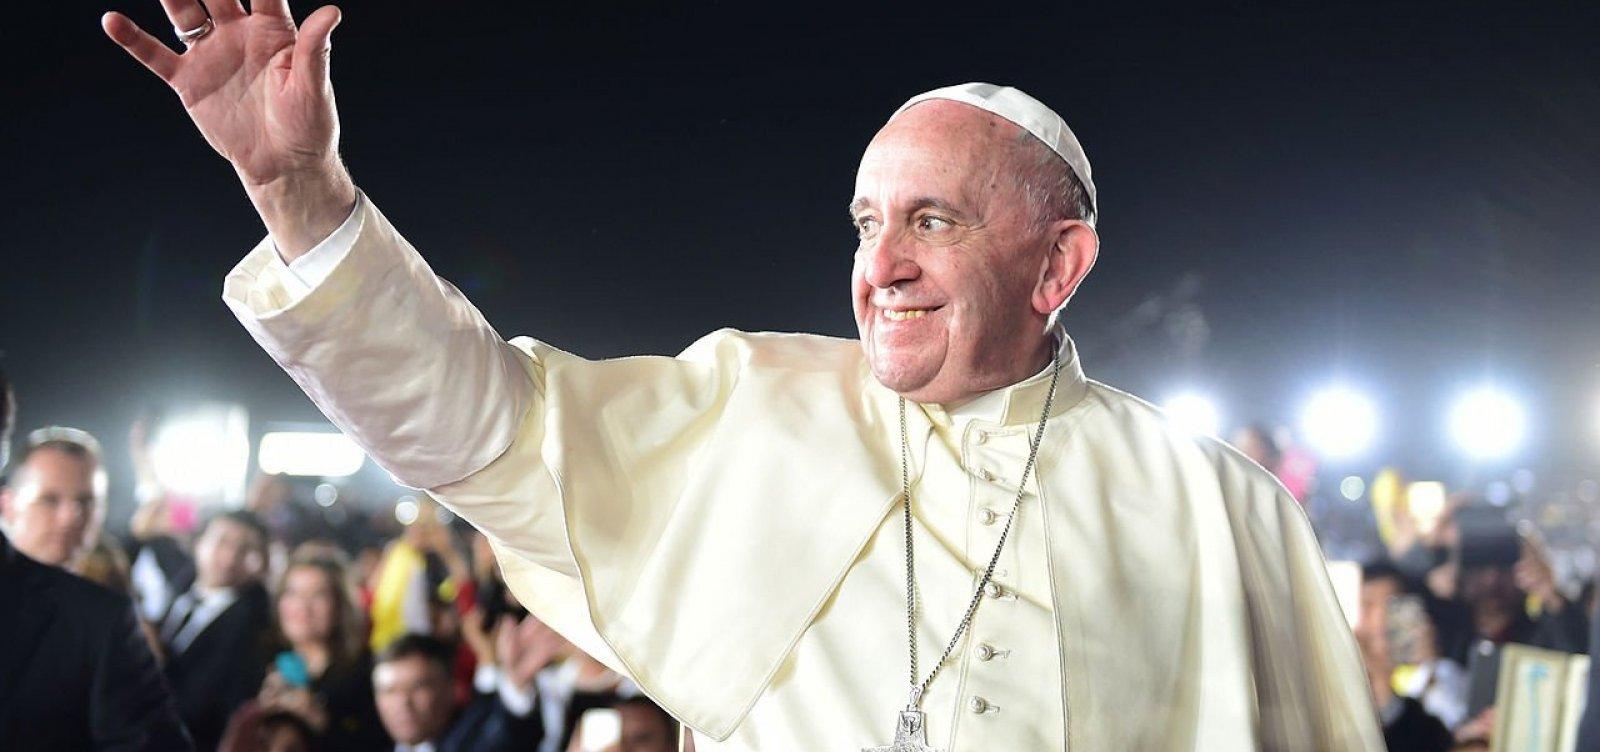 Papa Francisco emite decreto que obriga bispos a denunciar casos de abuso sexual